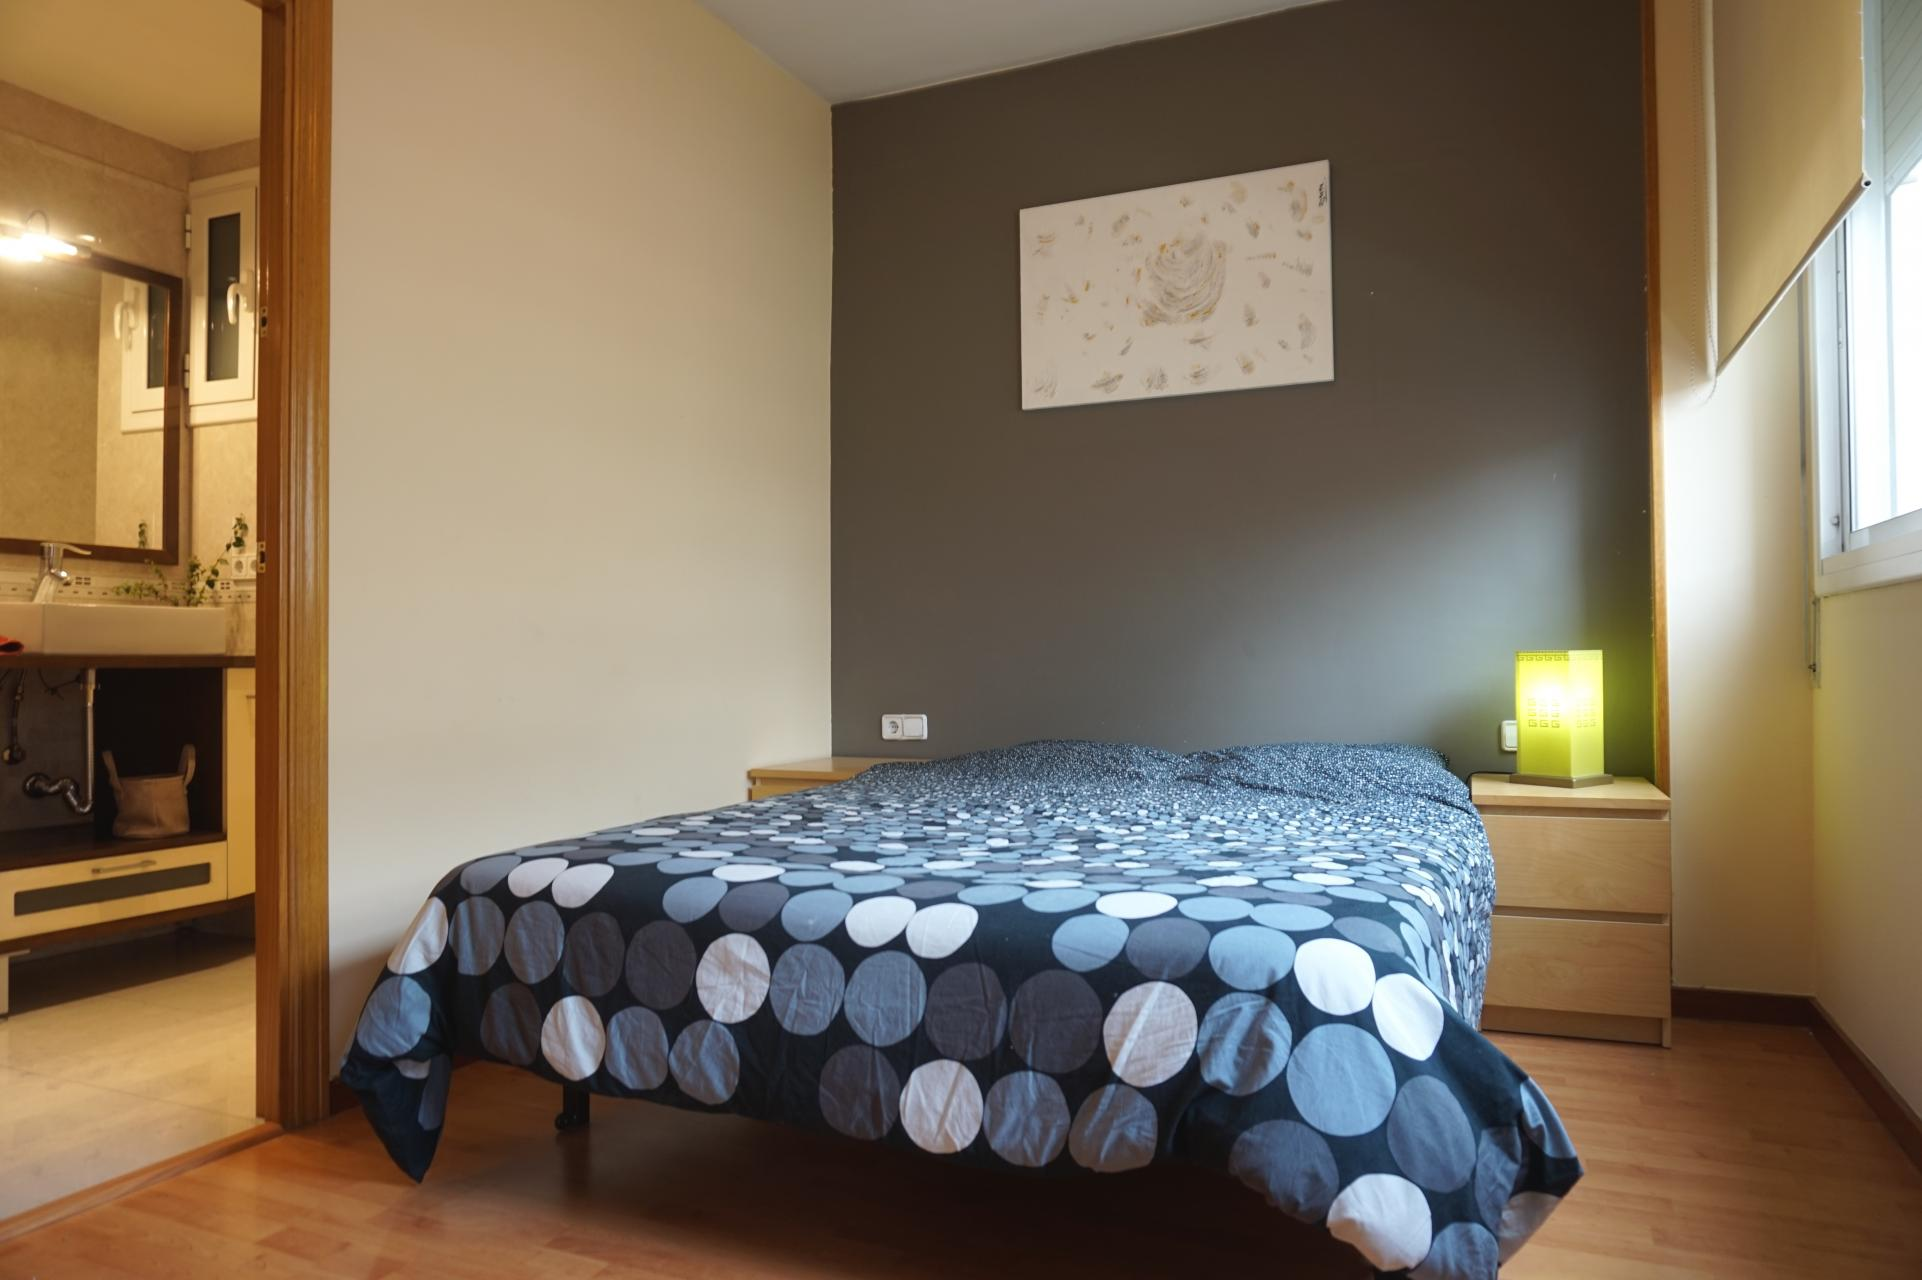 shbarcelona appartement en location longue dur e barcelone. Black Bedroom Furniture Sets. Home Design Ideas